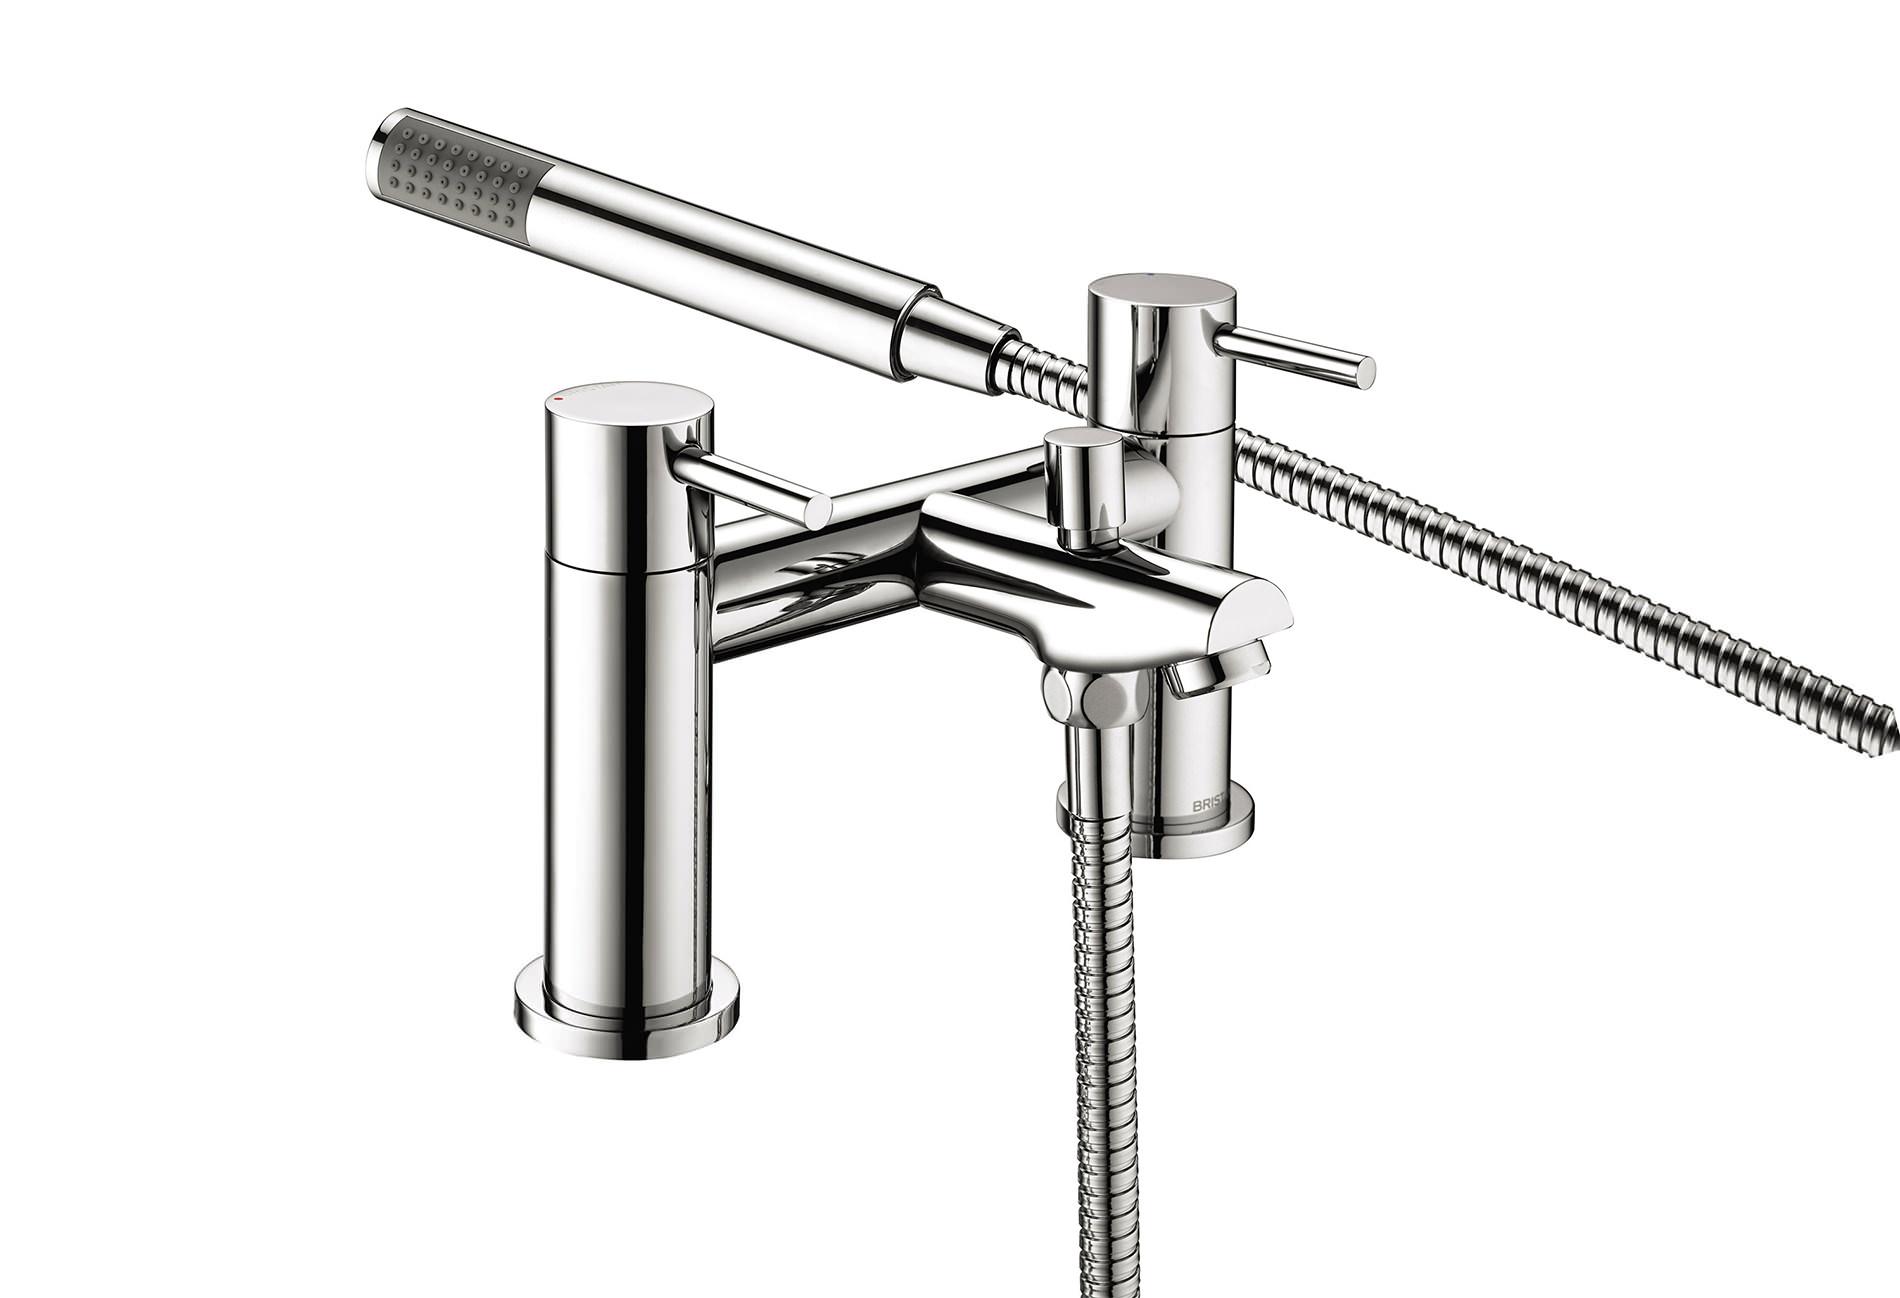 Bristan Blitz Bath Shower Mixer Tap Chrome